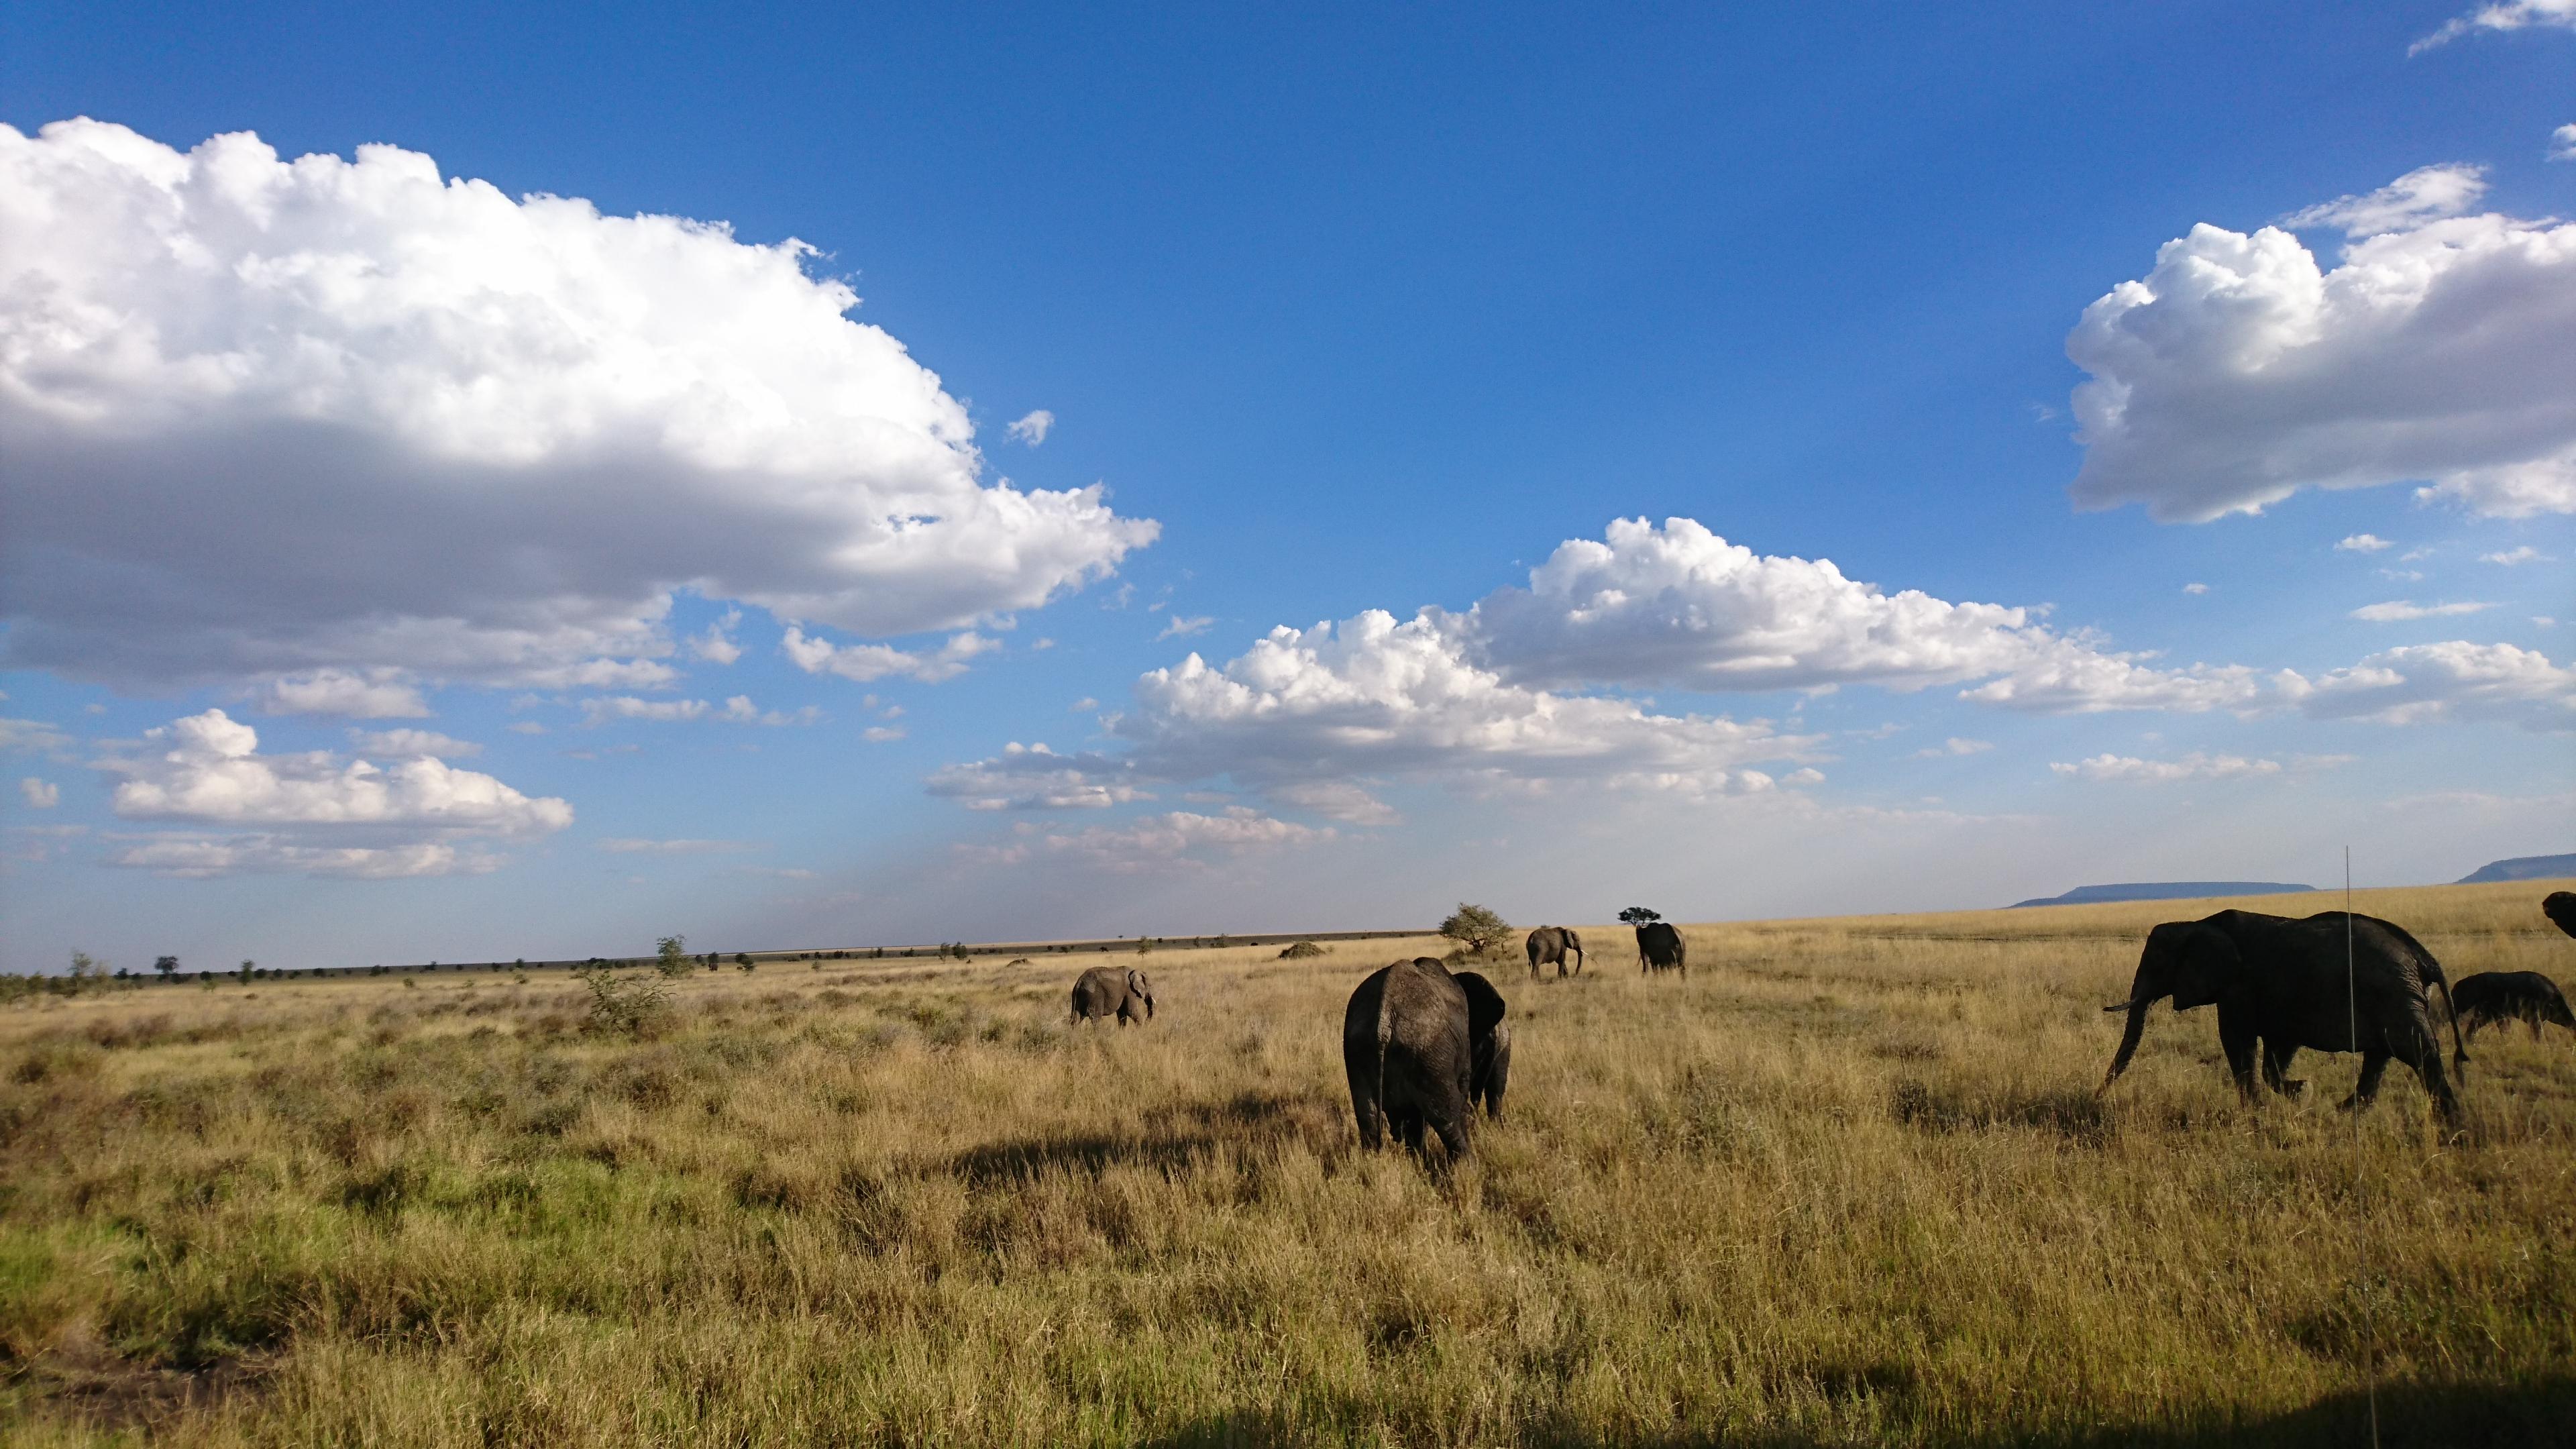 Elephants Serengeti National Park